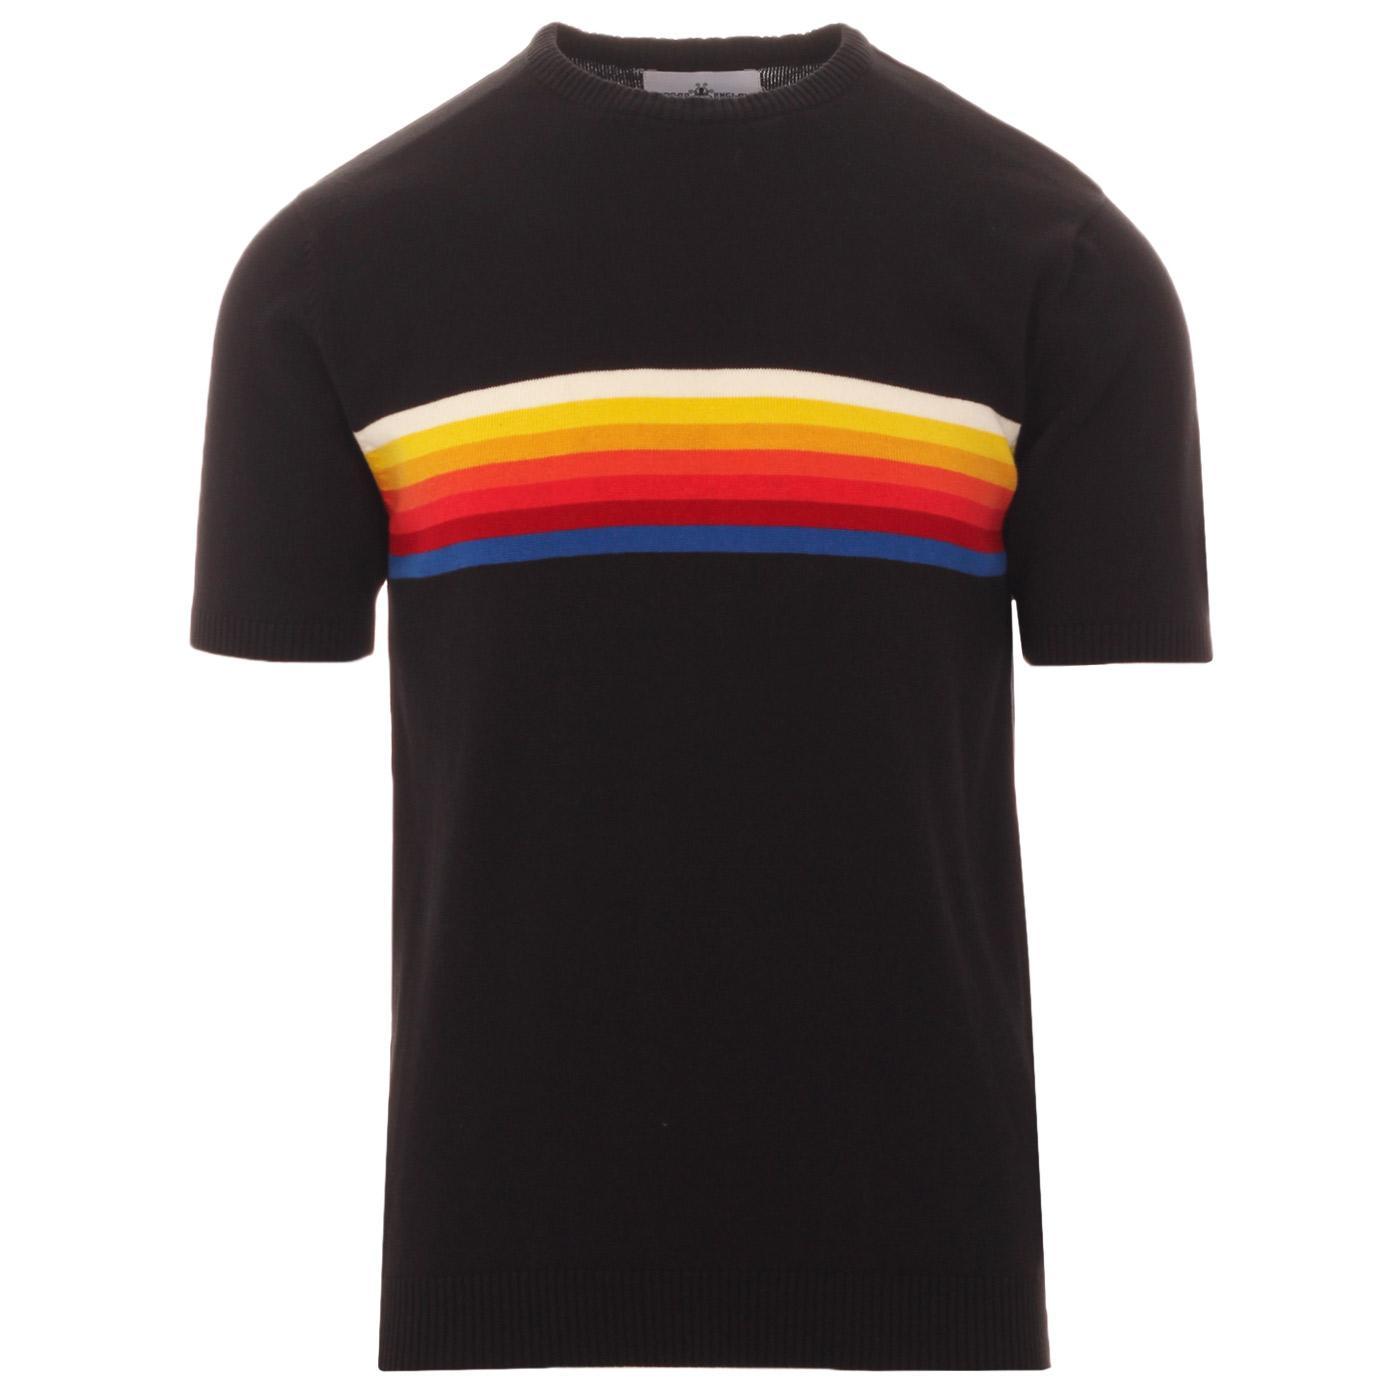 Britpop MADCAP ENGLAND Rainbow Stripe Knit Tee (B)